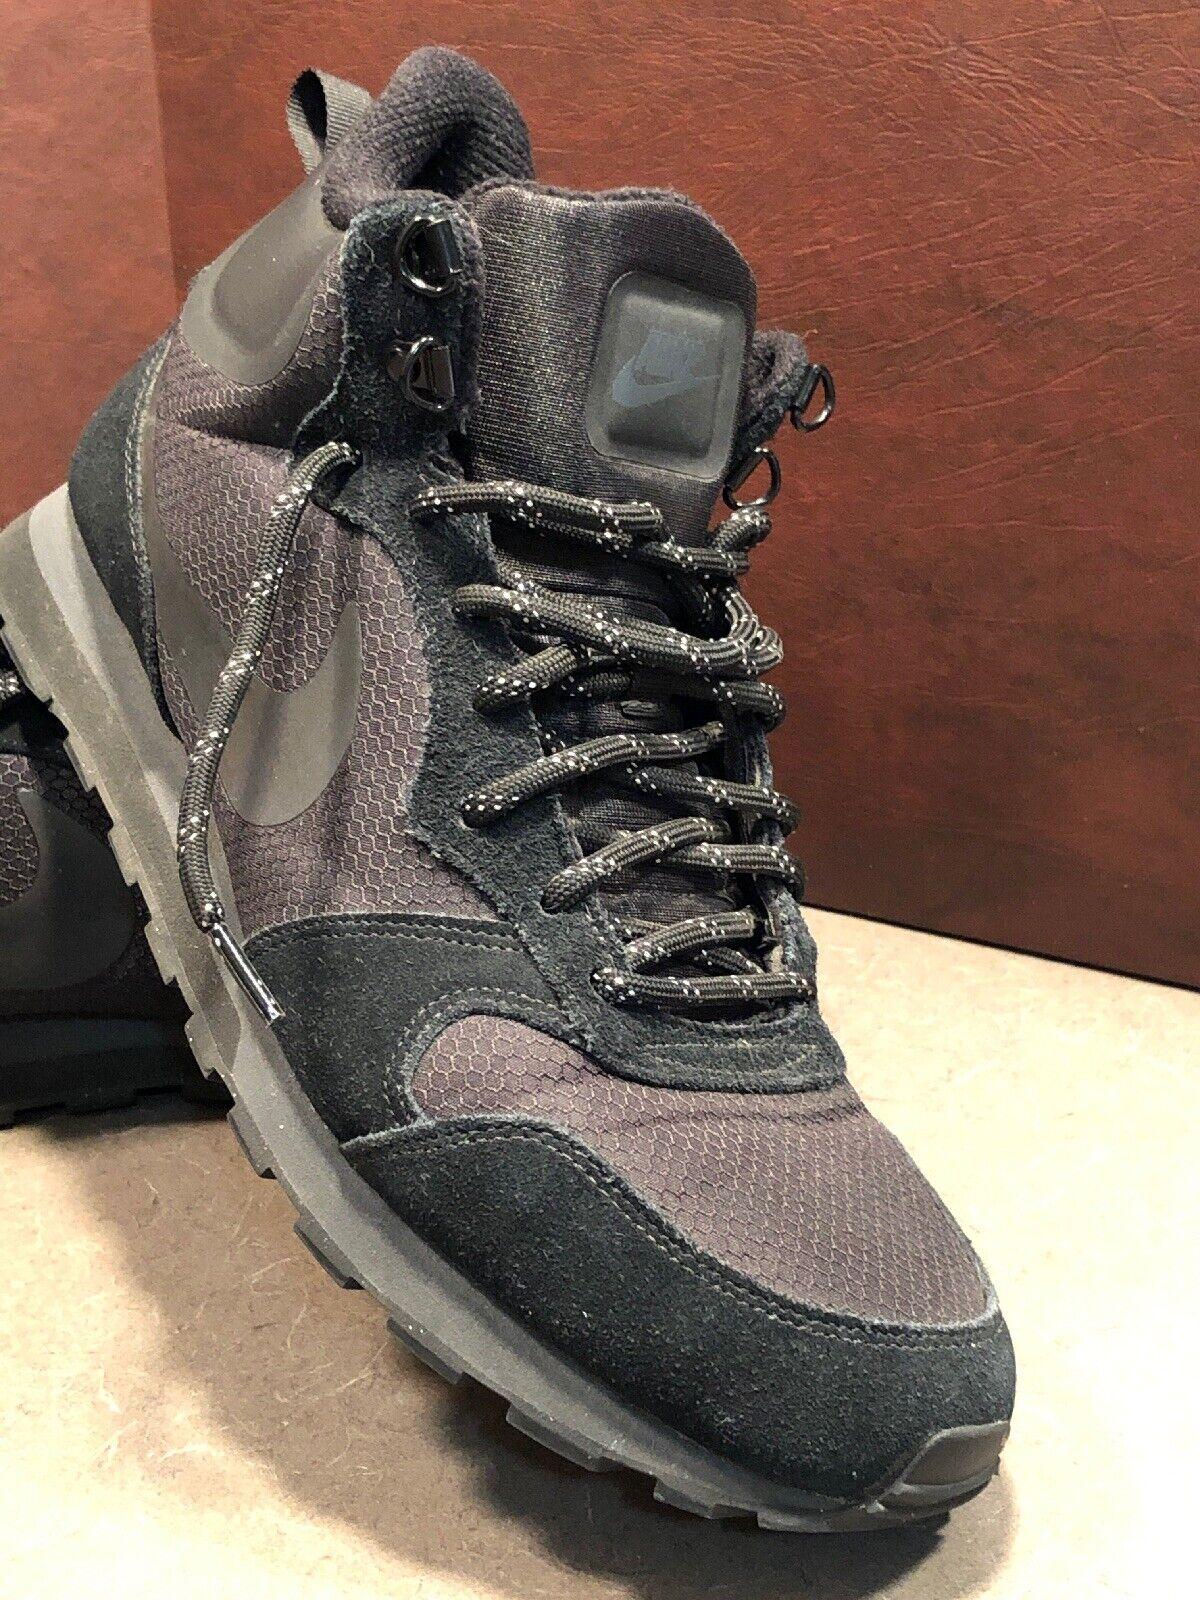 Nike Men MD Runner 2 Mid Premium Sneakerboots 844864 004 SIZE 12 Black